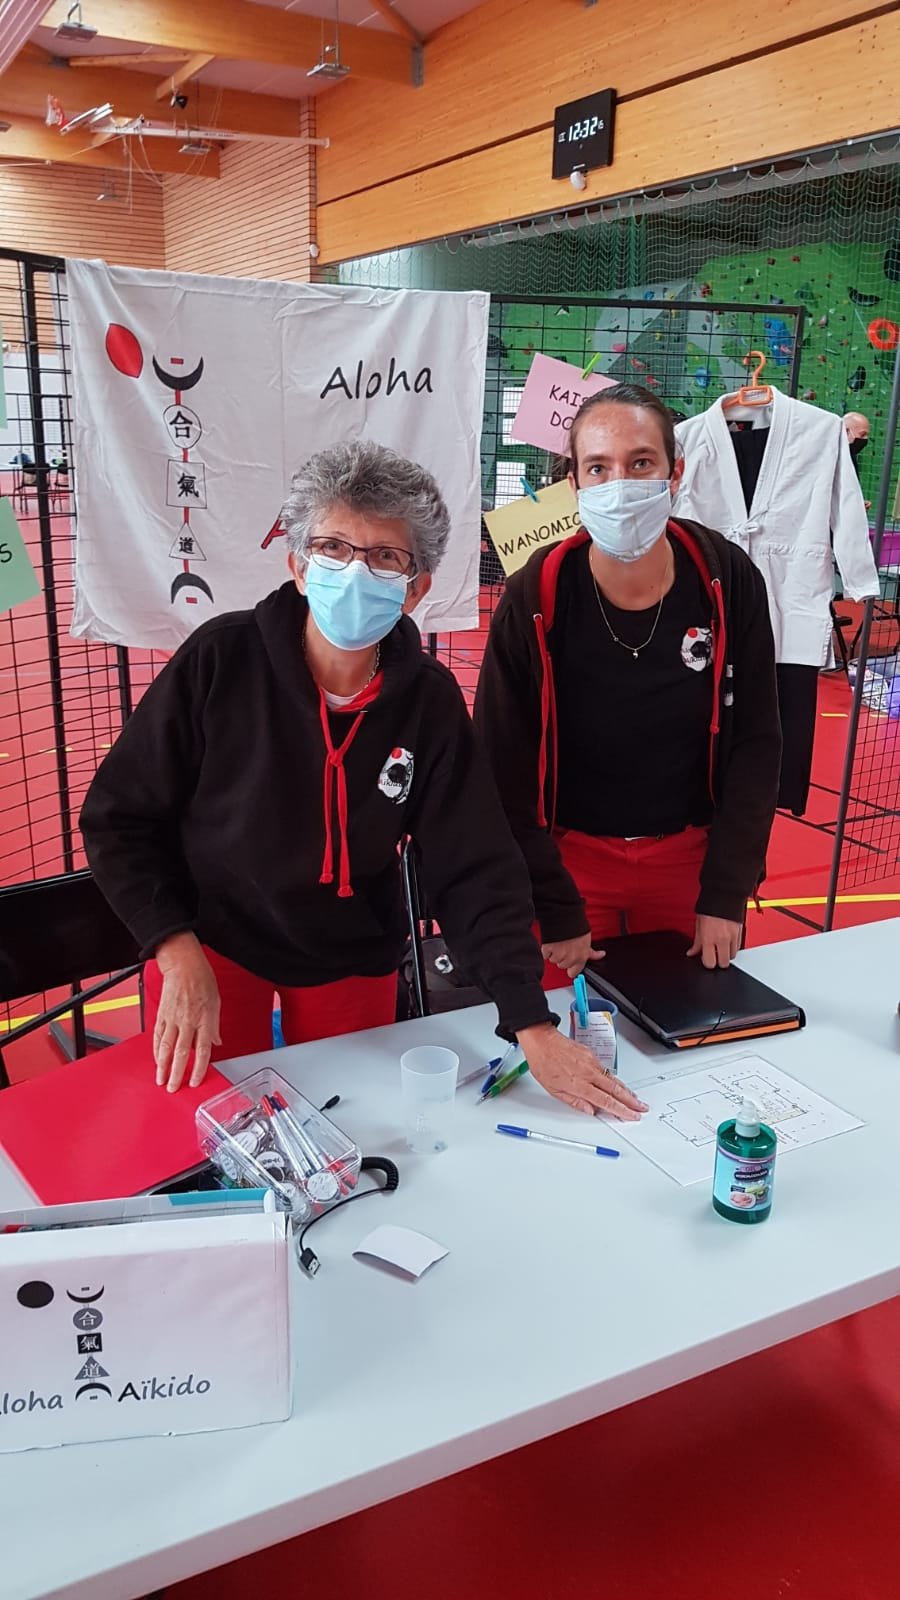 Morgane FALLON accueille les futur aïkidoka au forum des associations de Plougoumelen